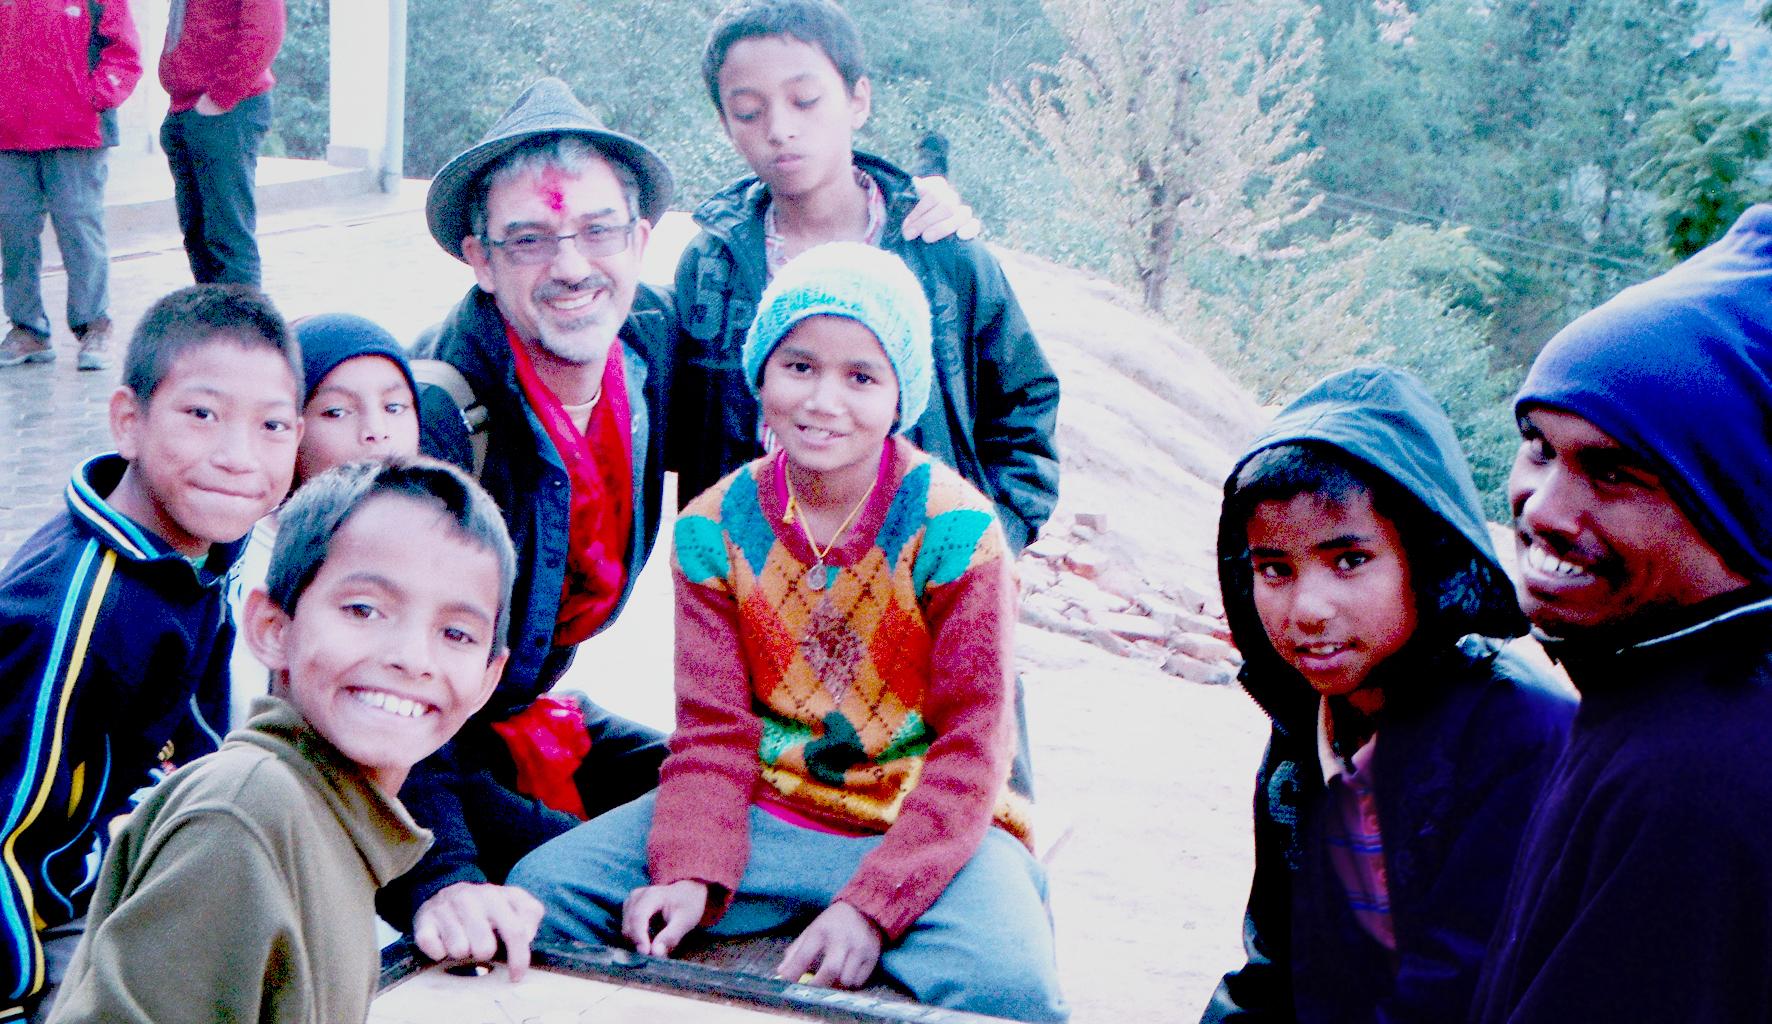 Joe Komodo with some of the kids at Sunrise Orphanage